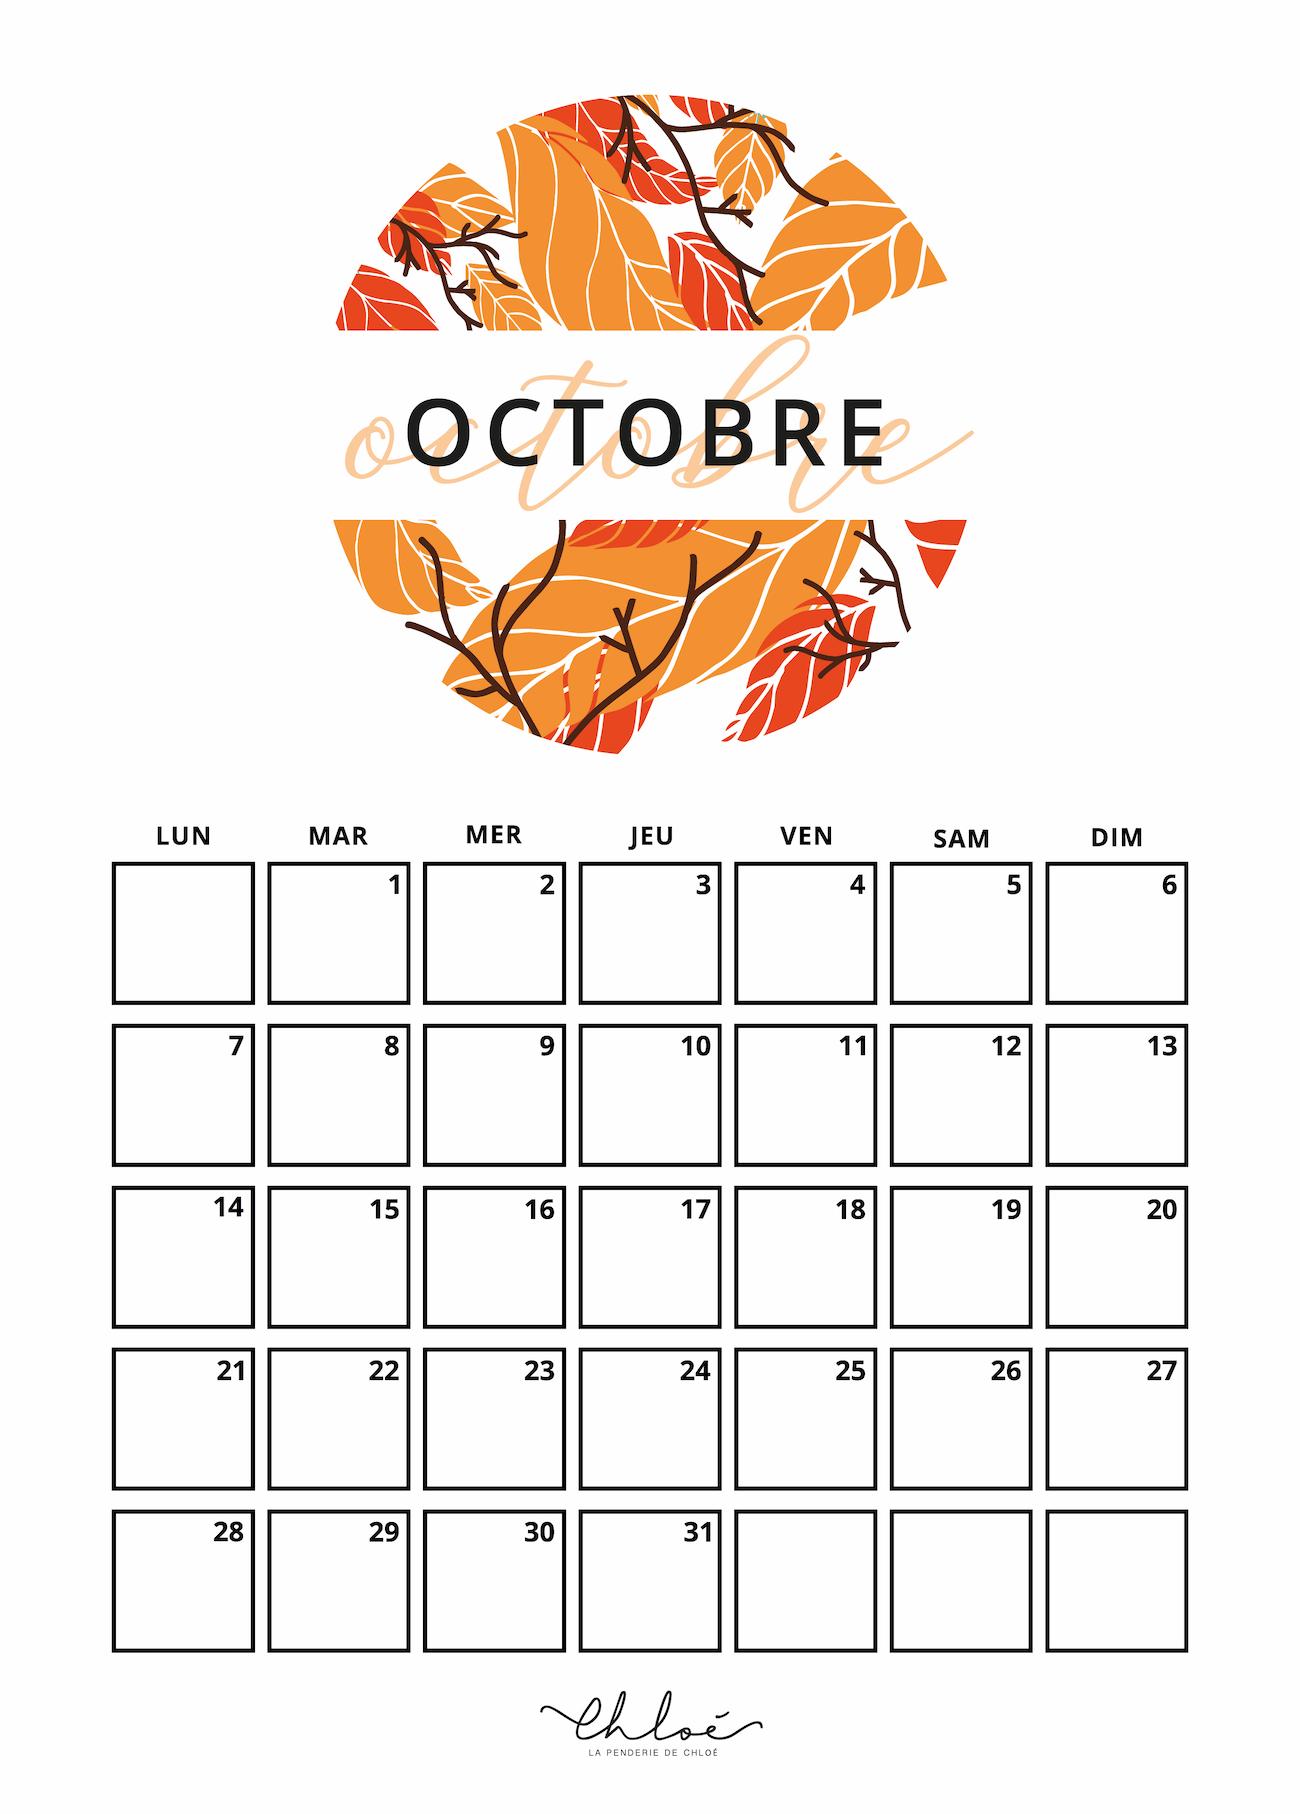 Octobre Calendrier 2019.Calendriers A Imprimer Blog Lifestyle Graphisme La